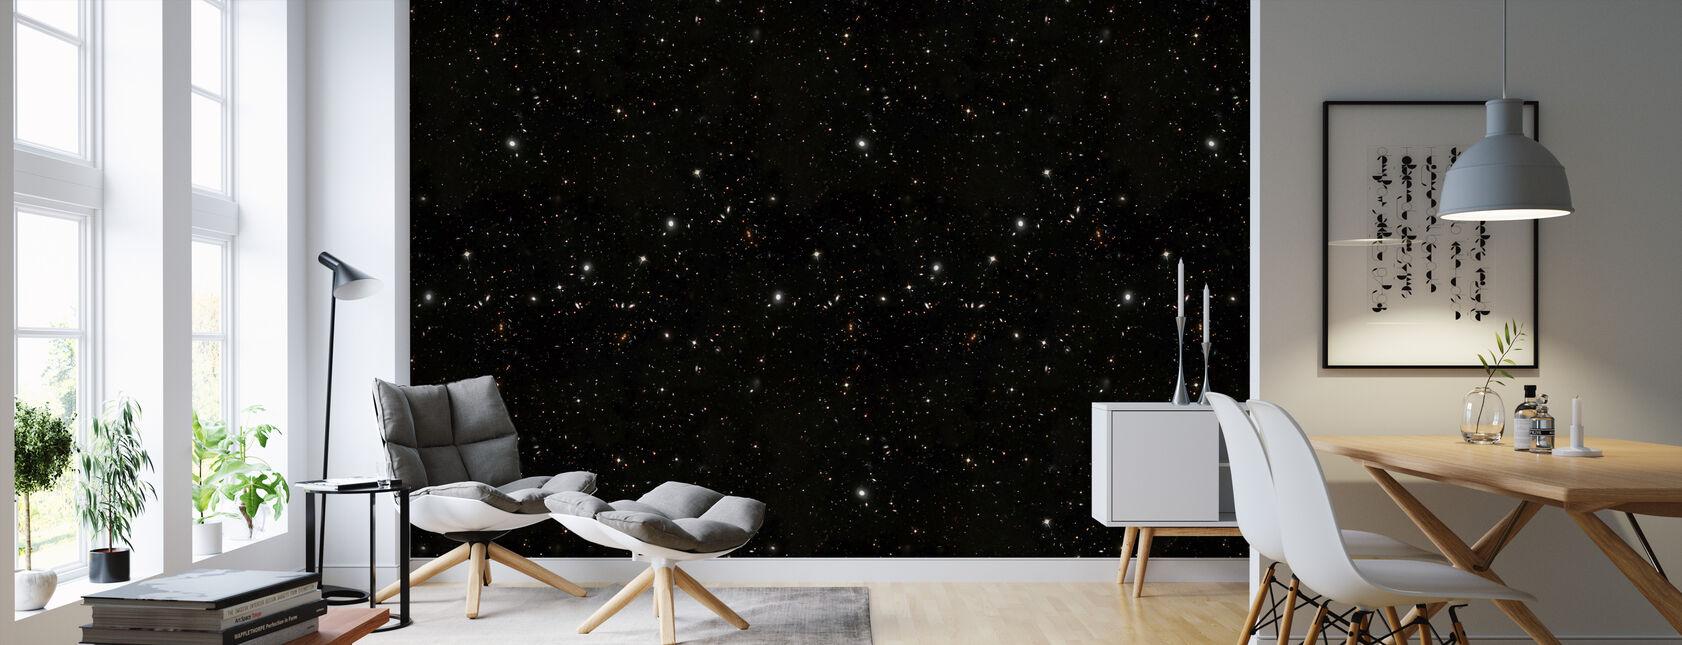 Astronomie & Weltraum